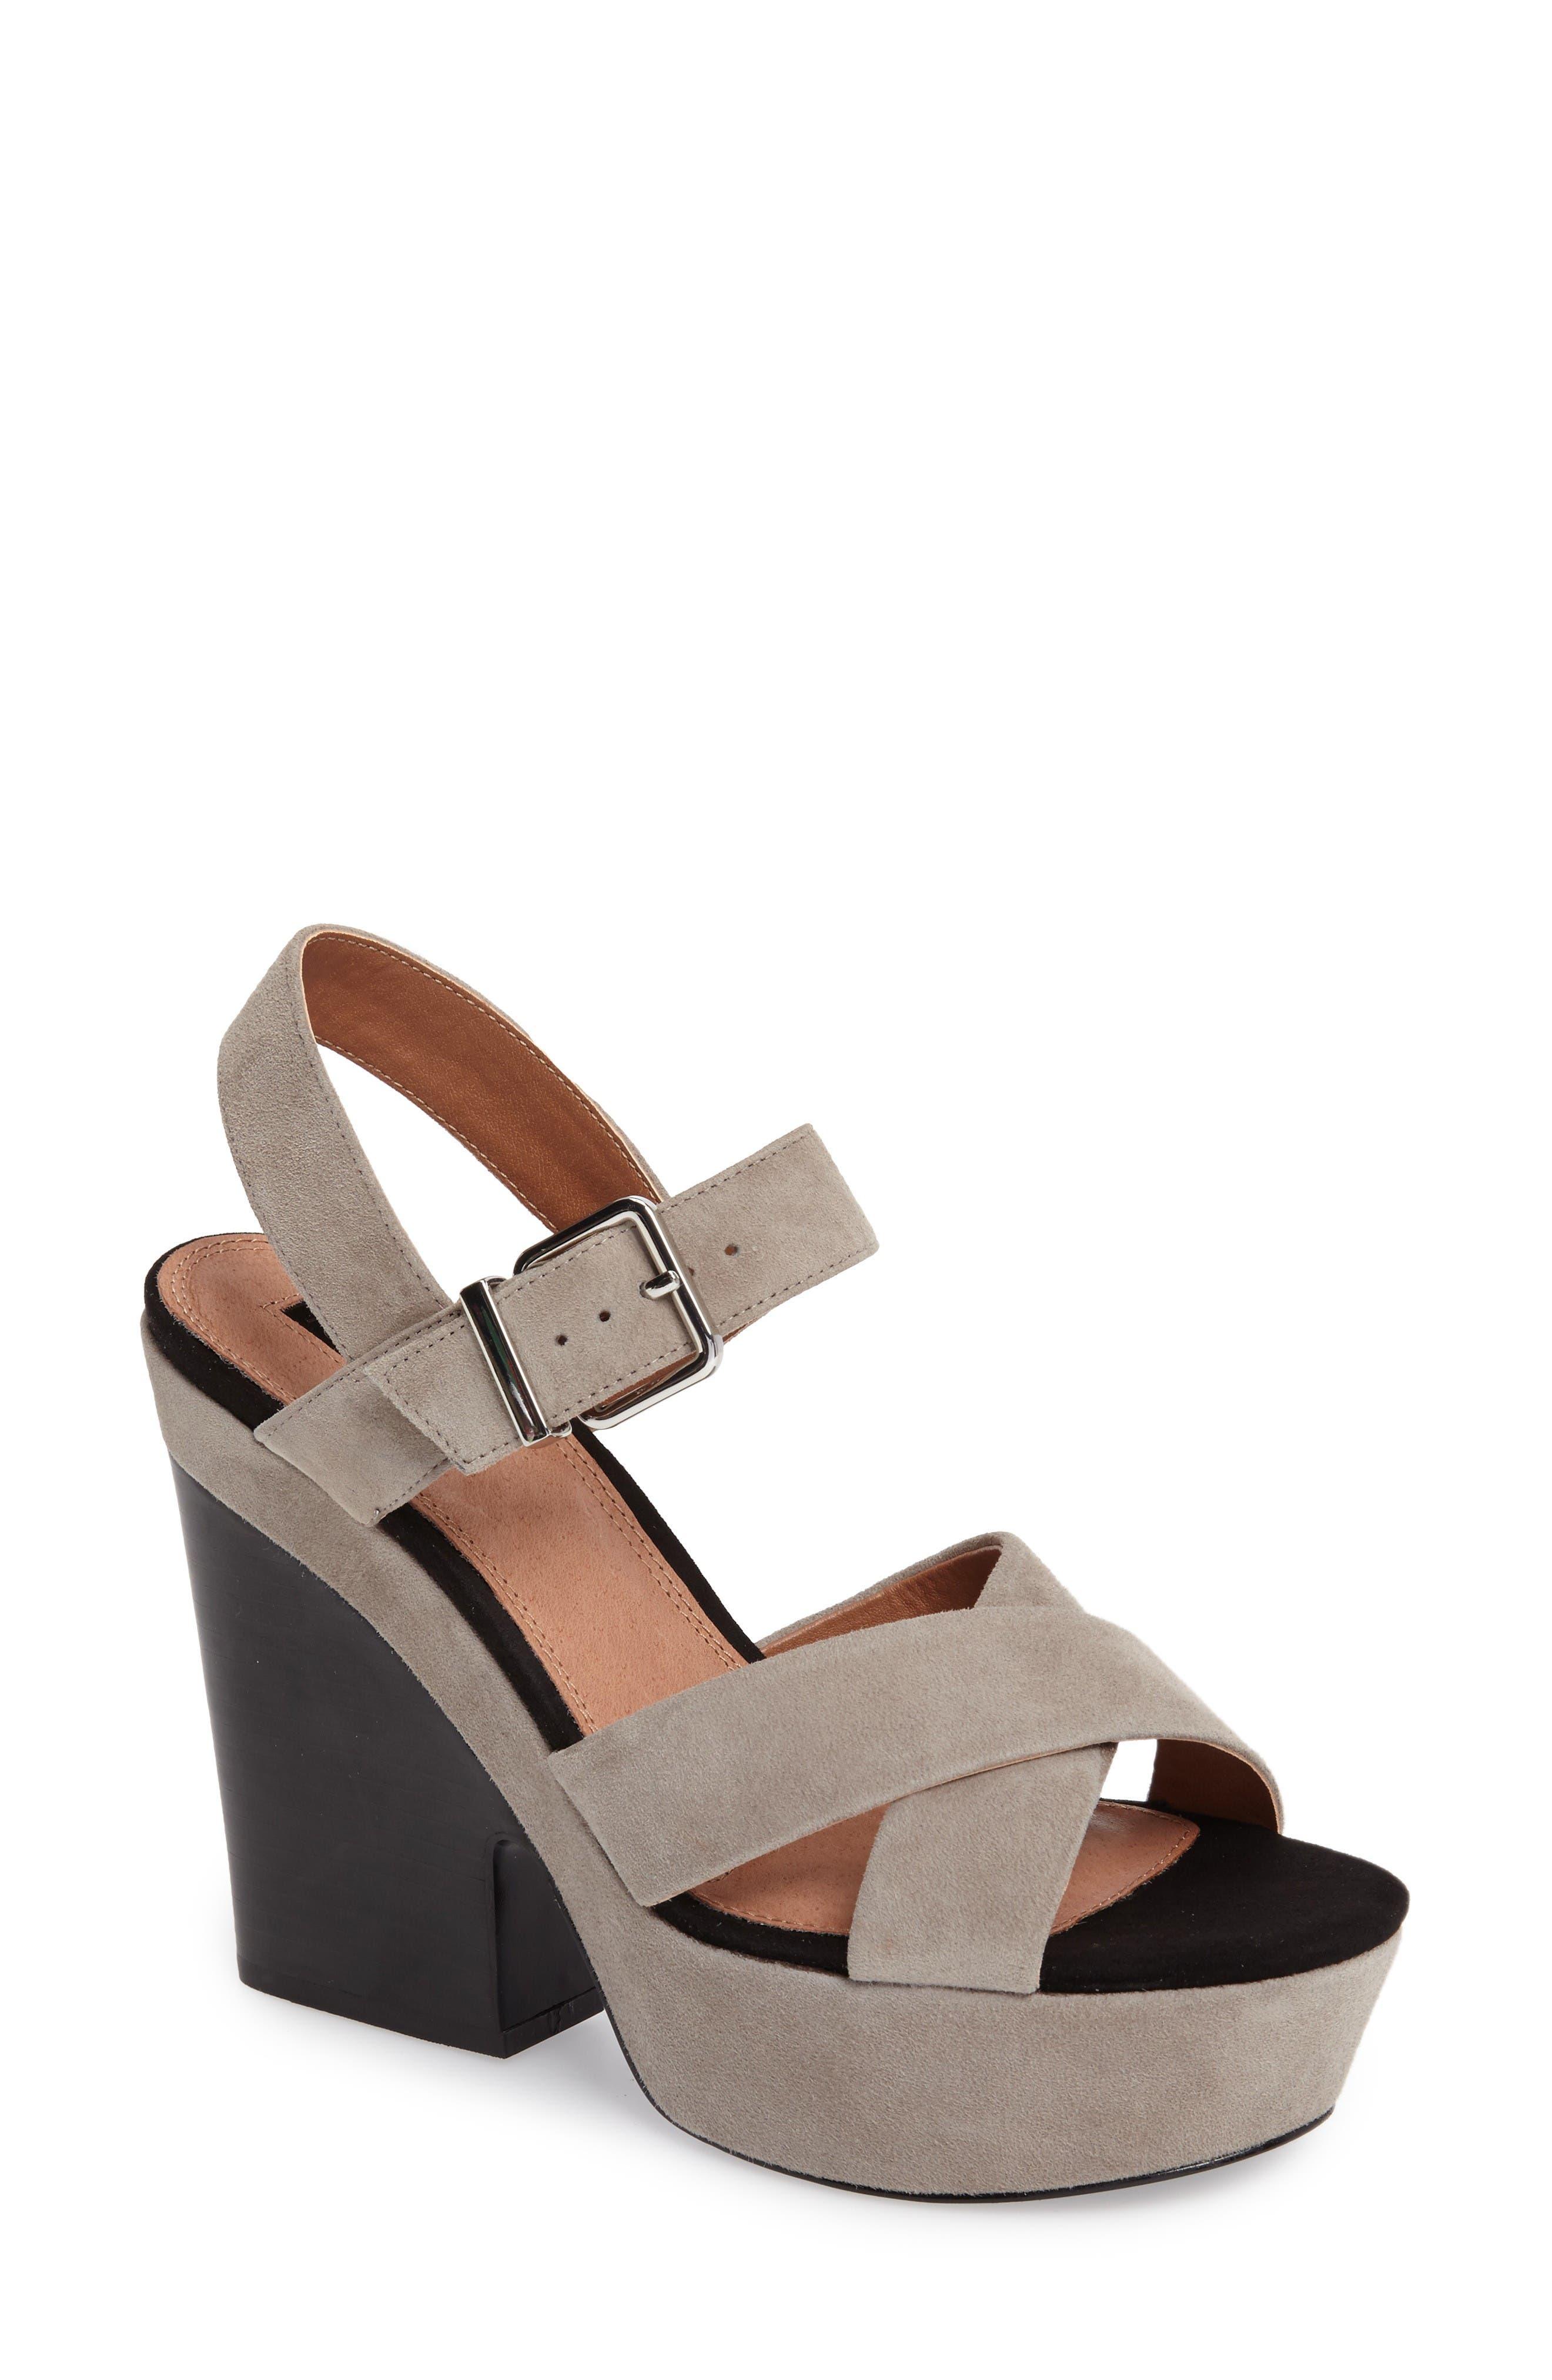 Main Image - Topshop Layla Platform Sandal (Women)